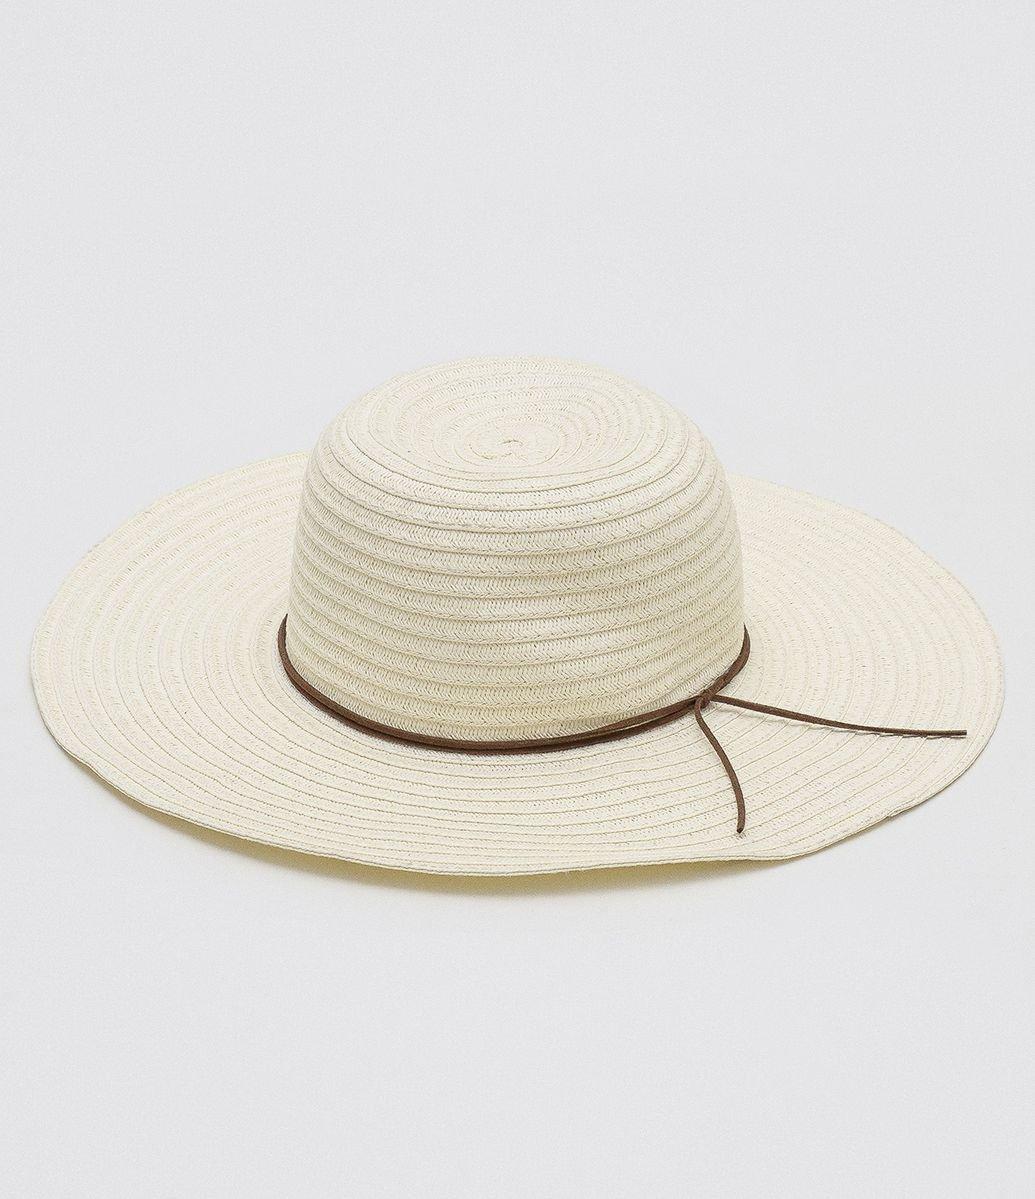 90c513d652c55 Chapéu de Palha - Renner